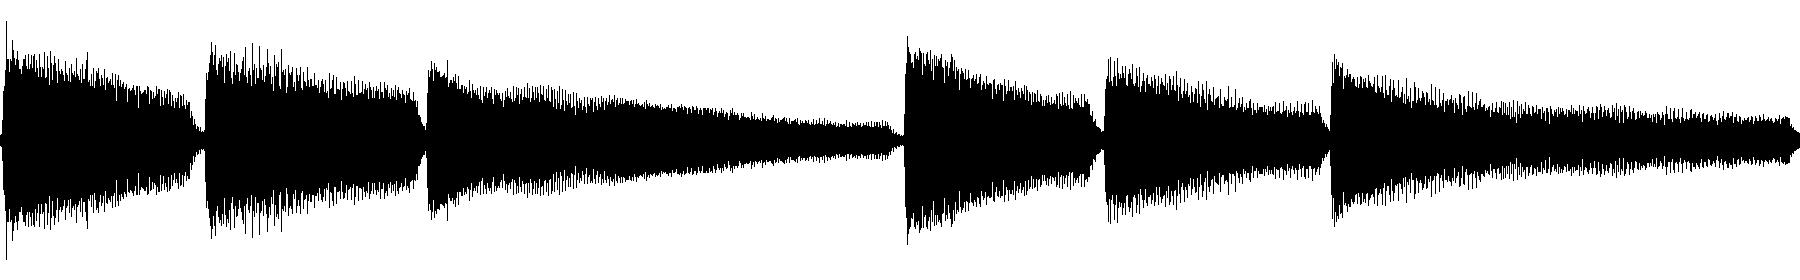 90 b piano radiosong 01